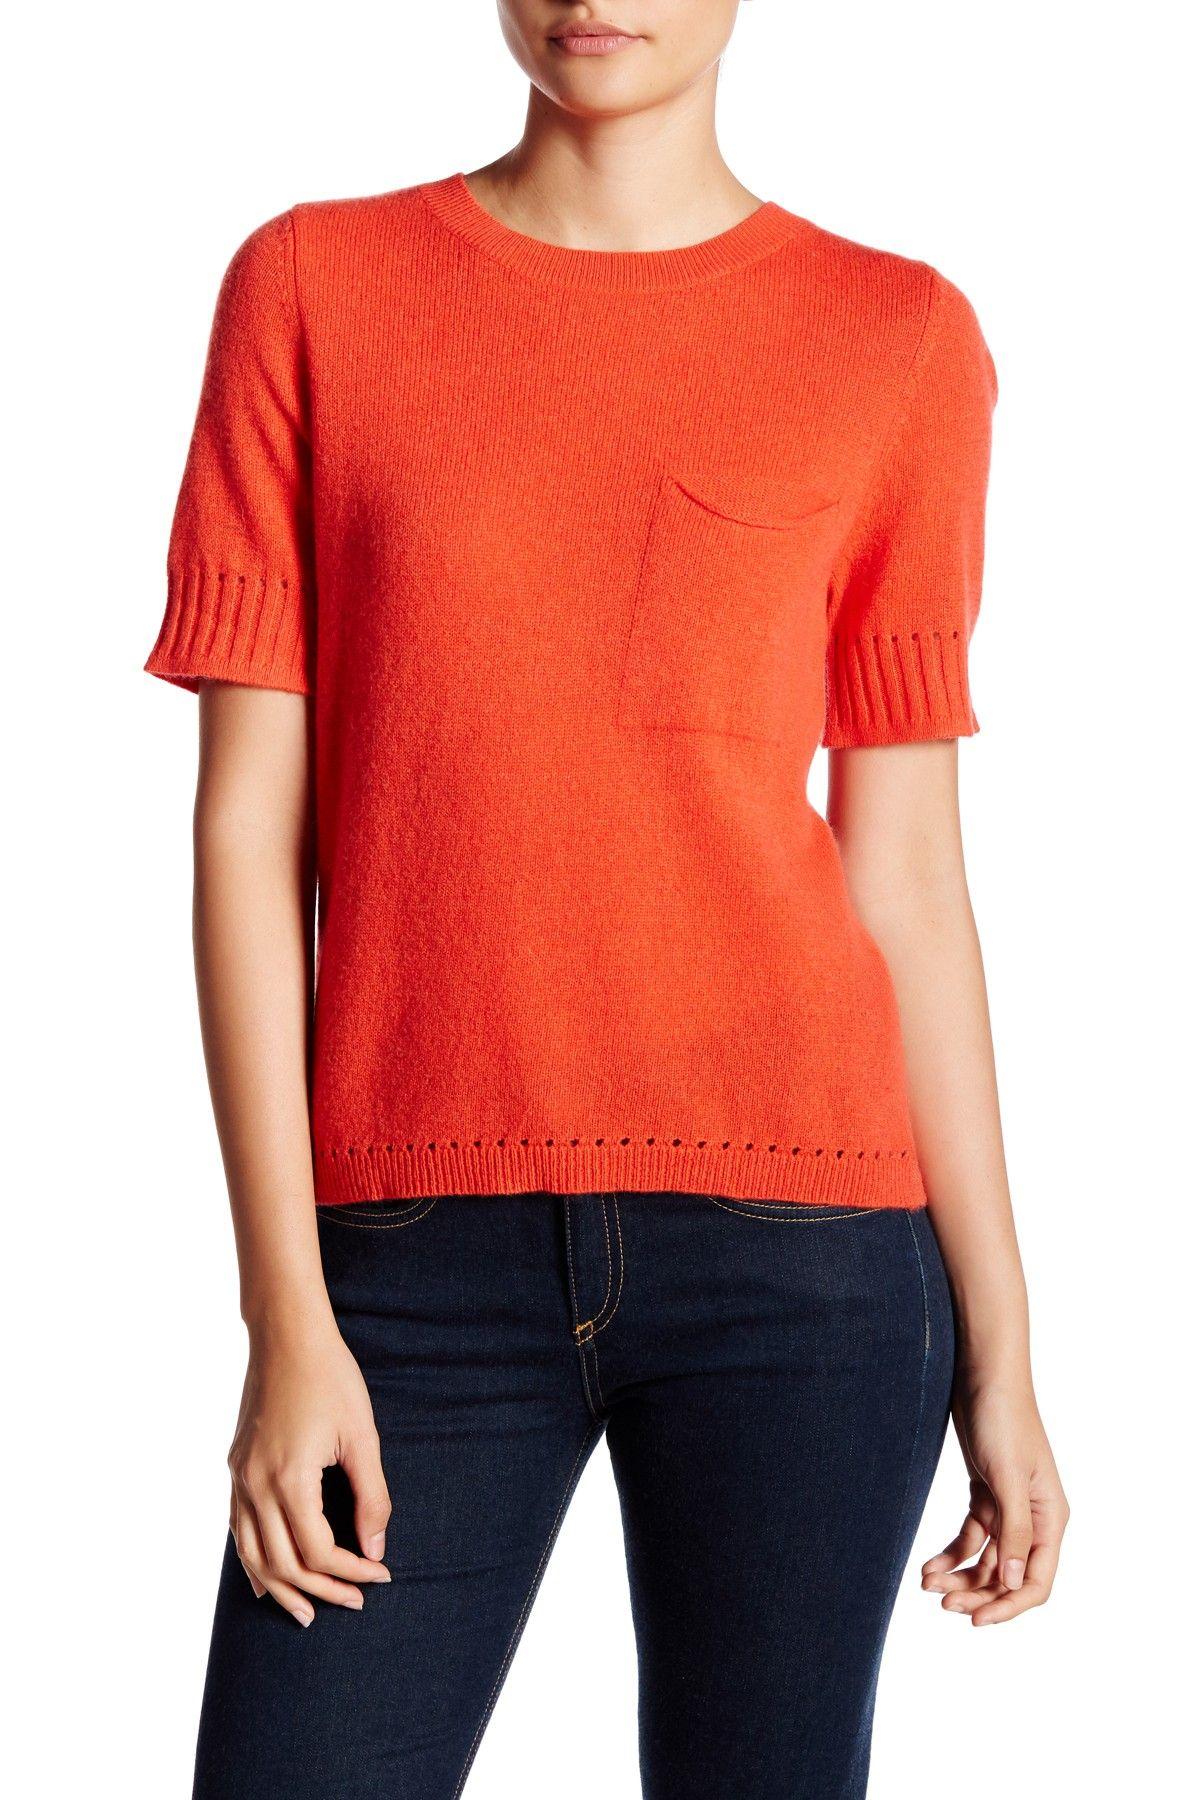 Short Sleeve Pocket Cashmere Sweater (Petite) | Shorts, Shops and ...